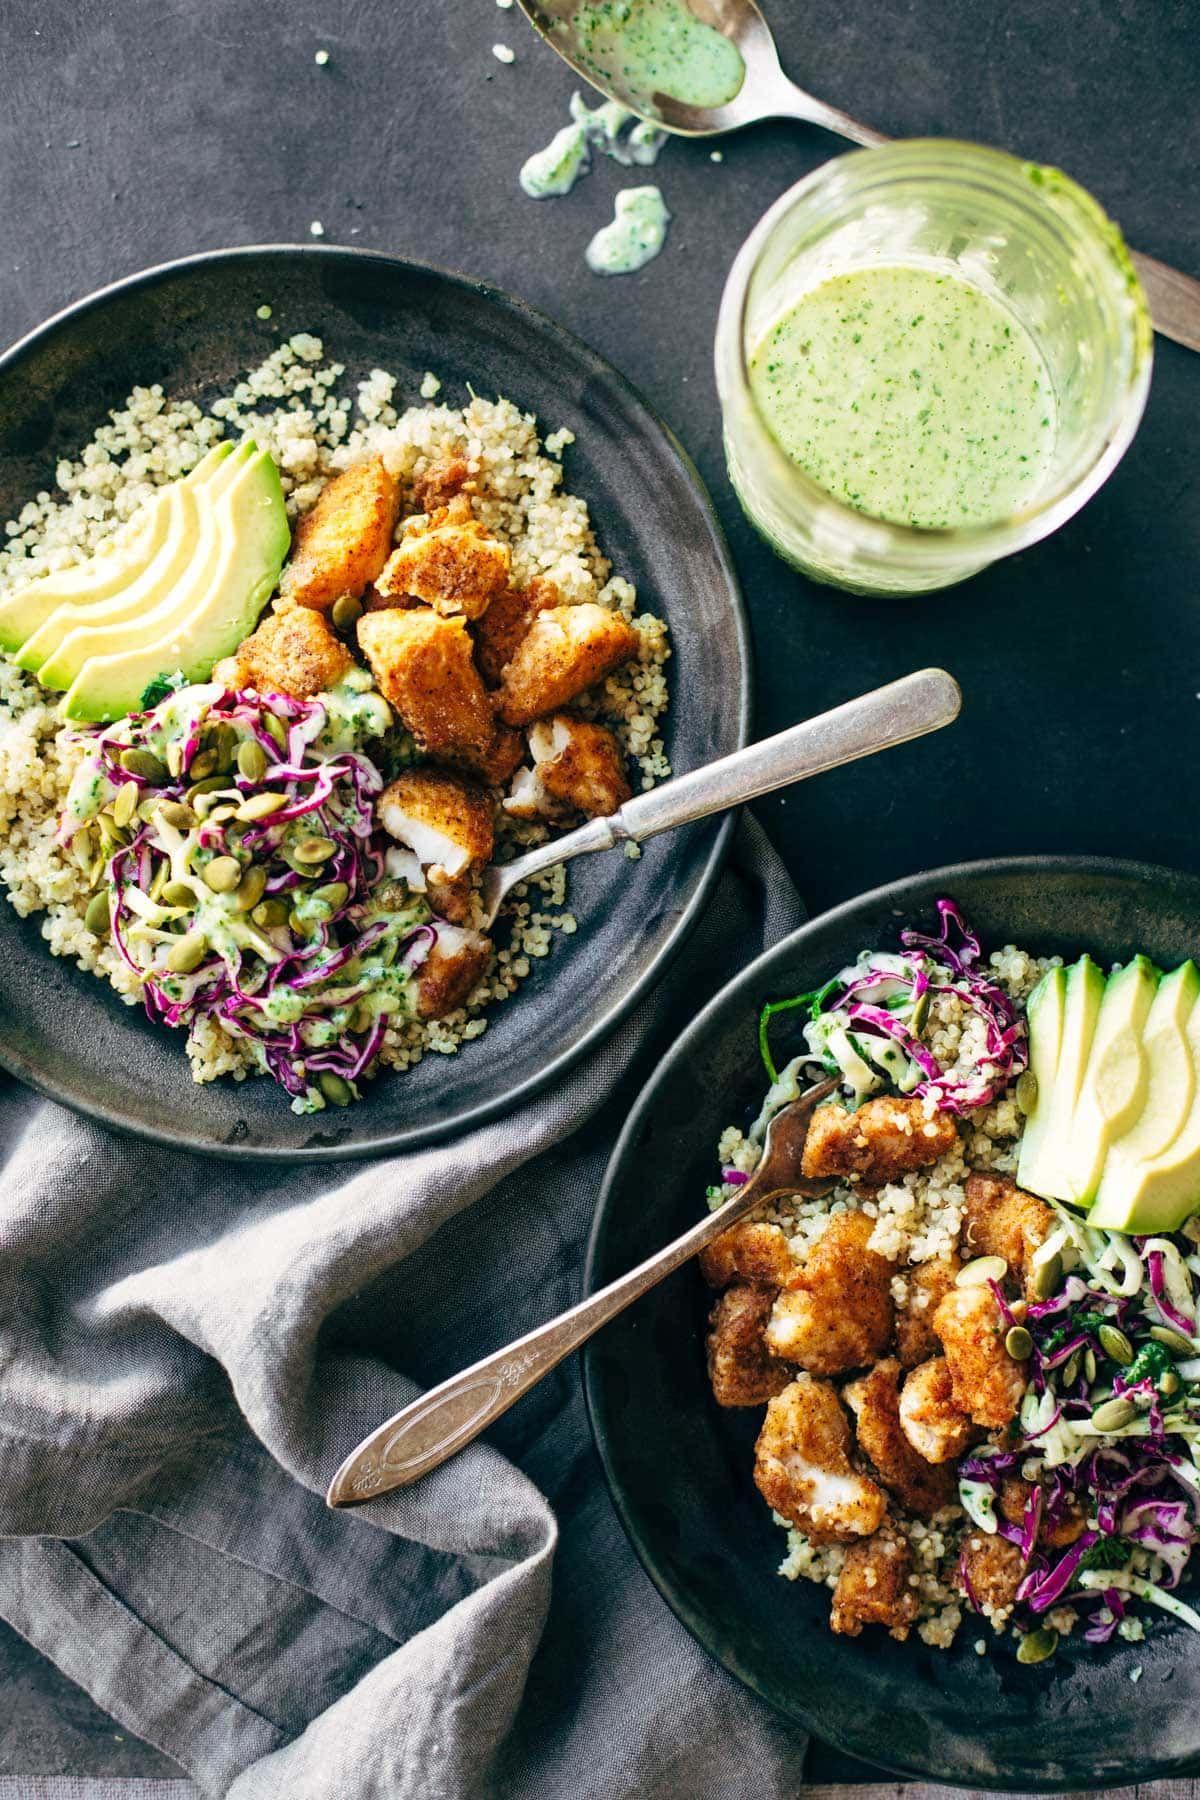 Spicy Fish Taco Bowls with Cilantro Lime Slaw #cilantrolimeslaw